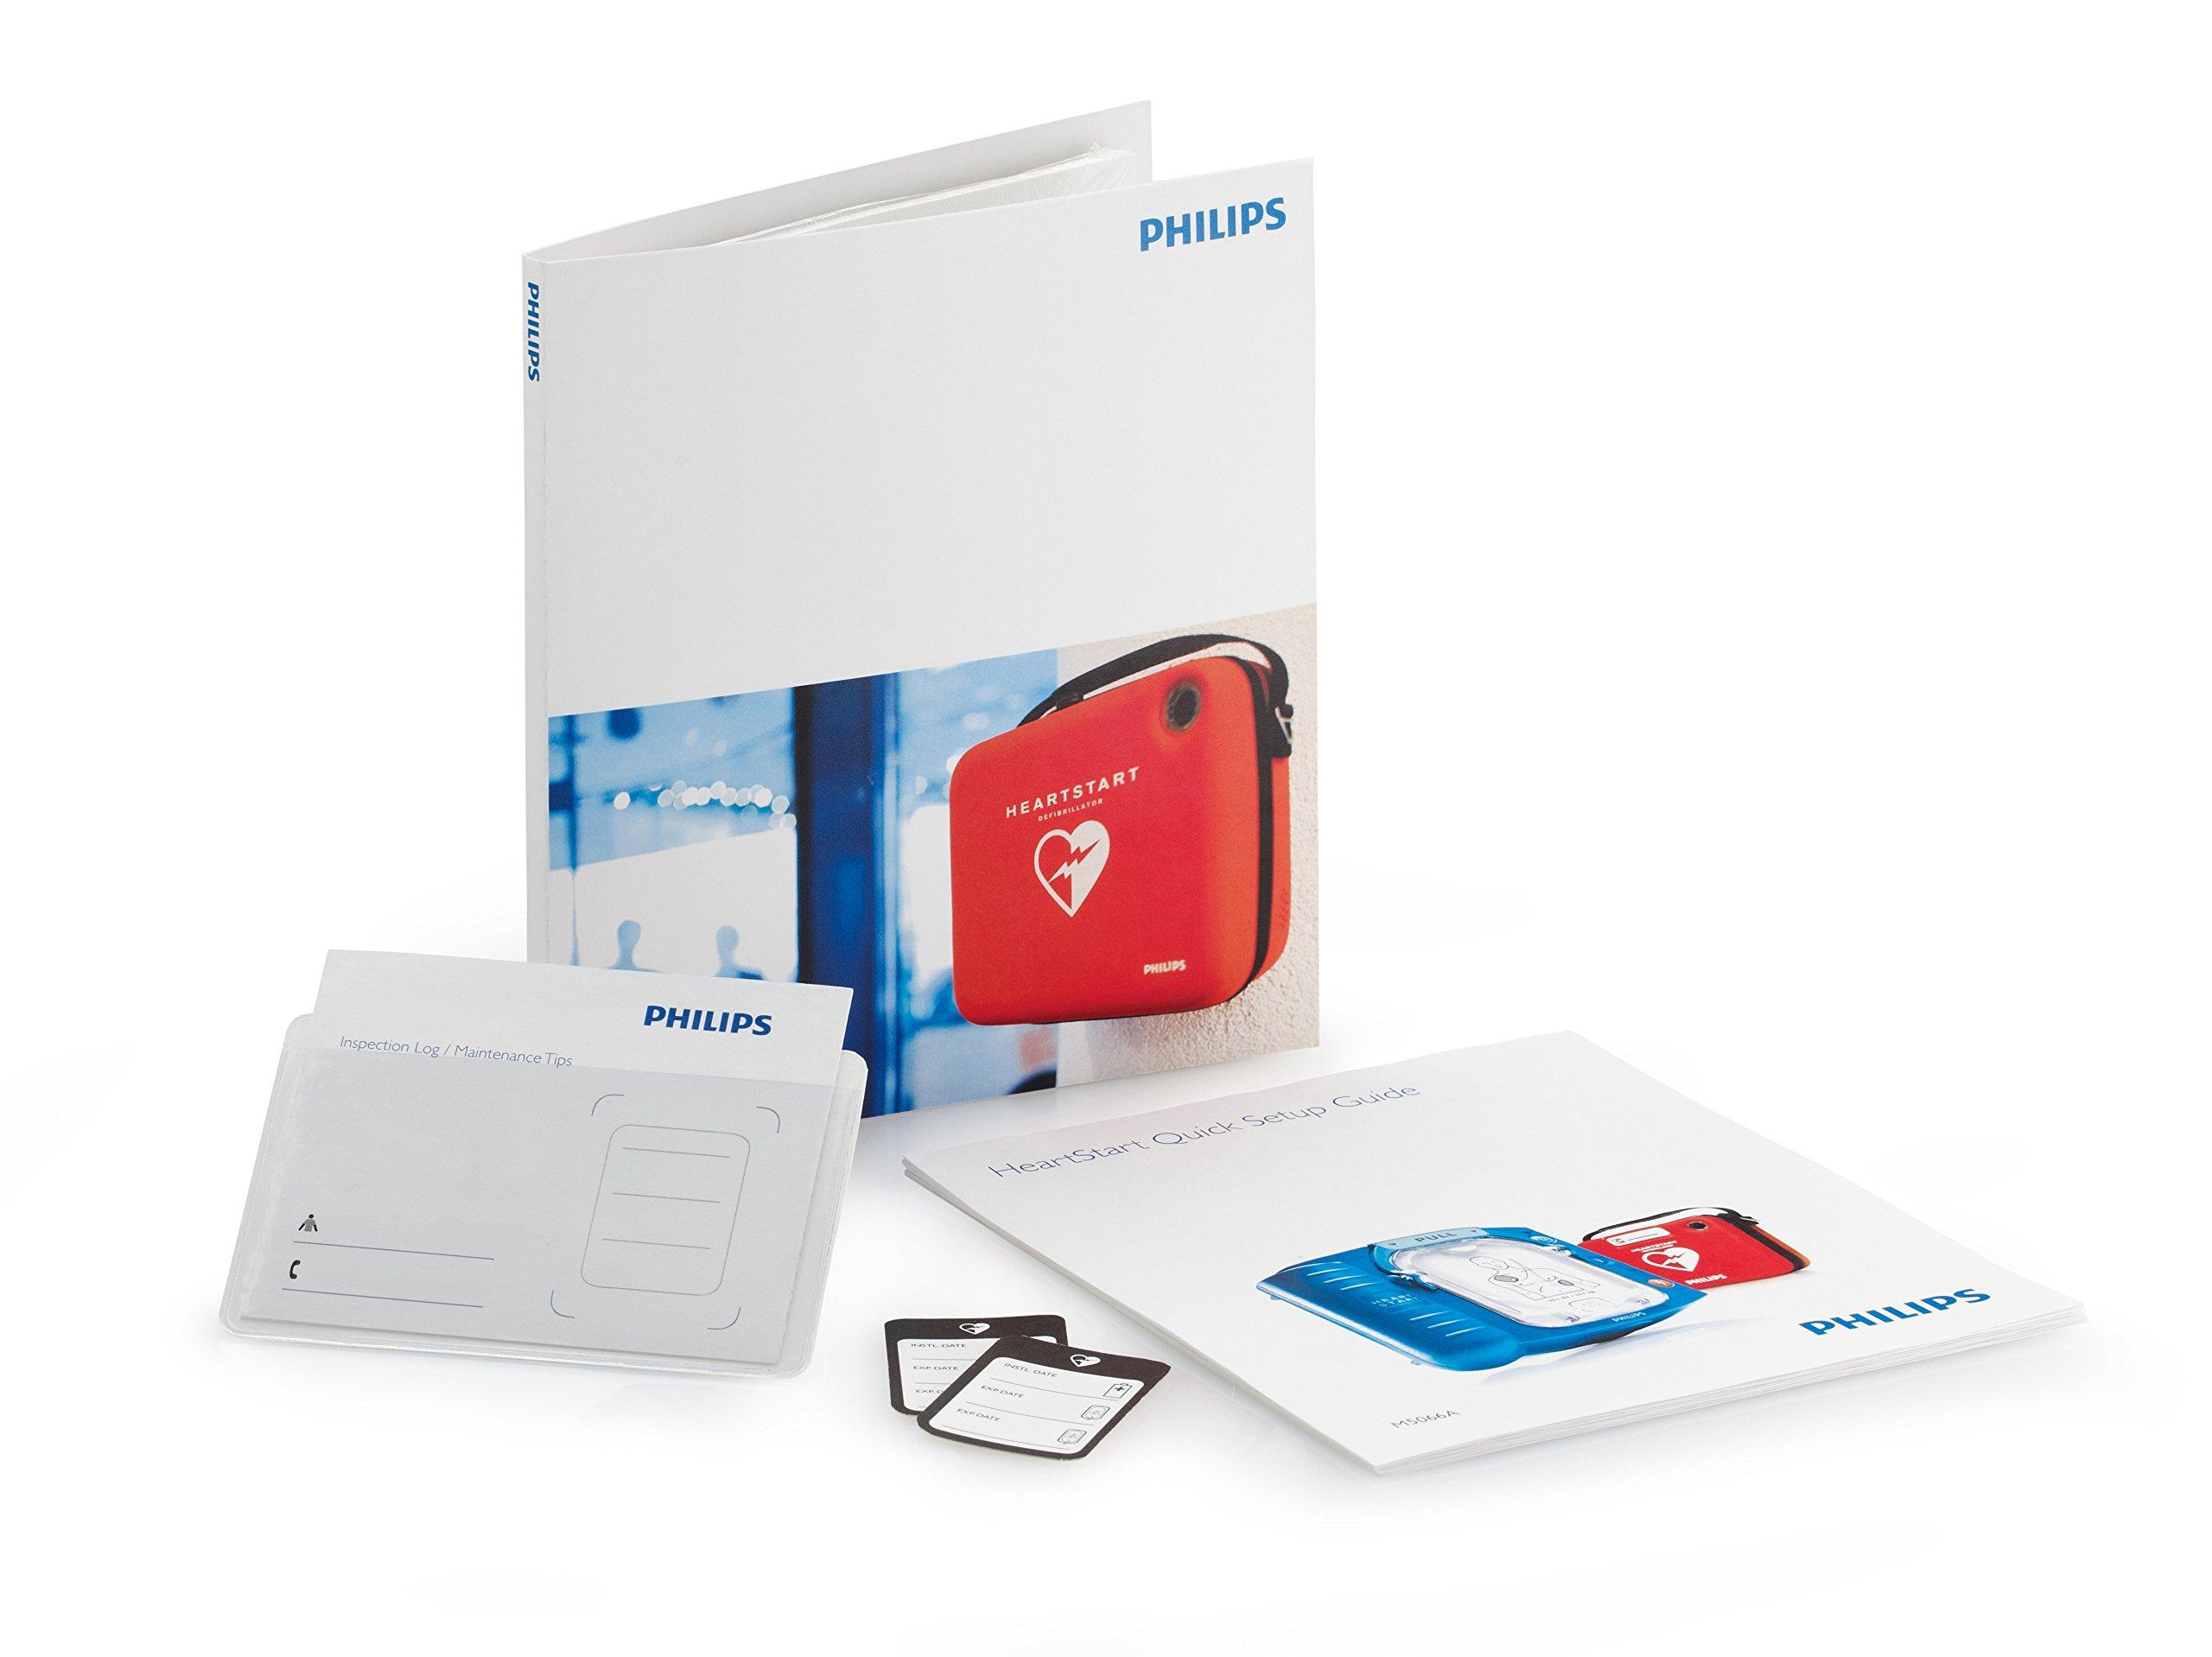 Philips HeartStart M5066-91900 Onsite Instructions for Use